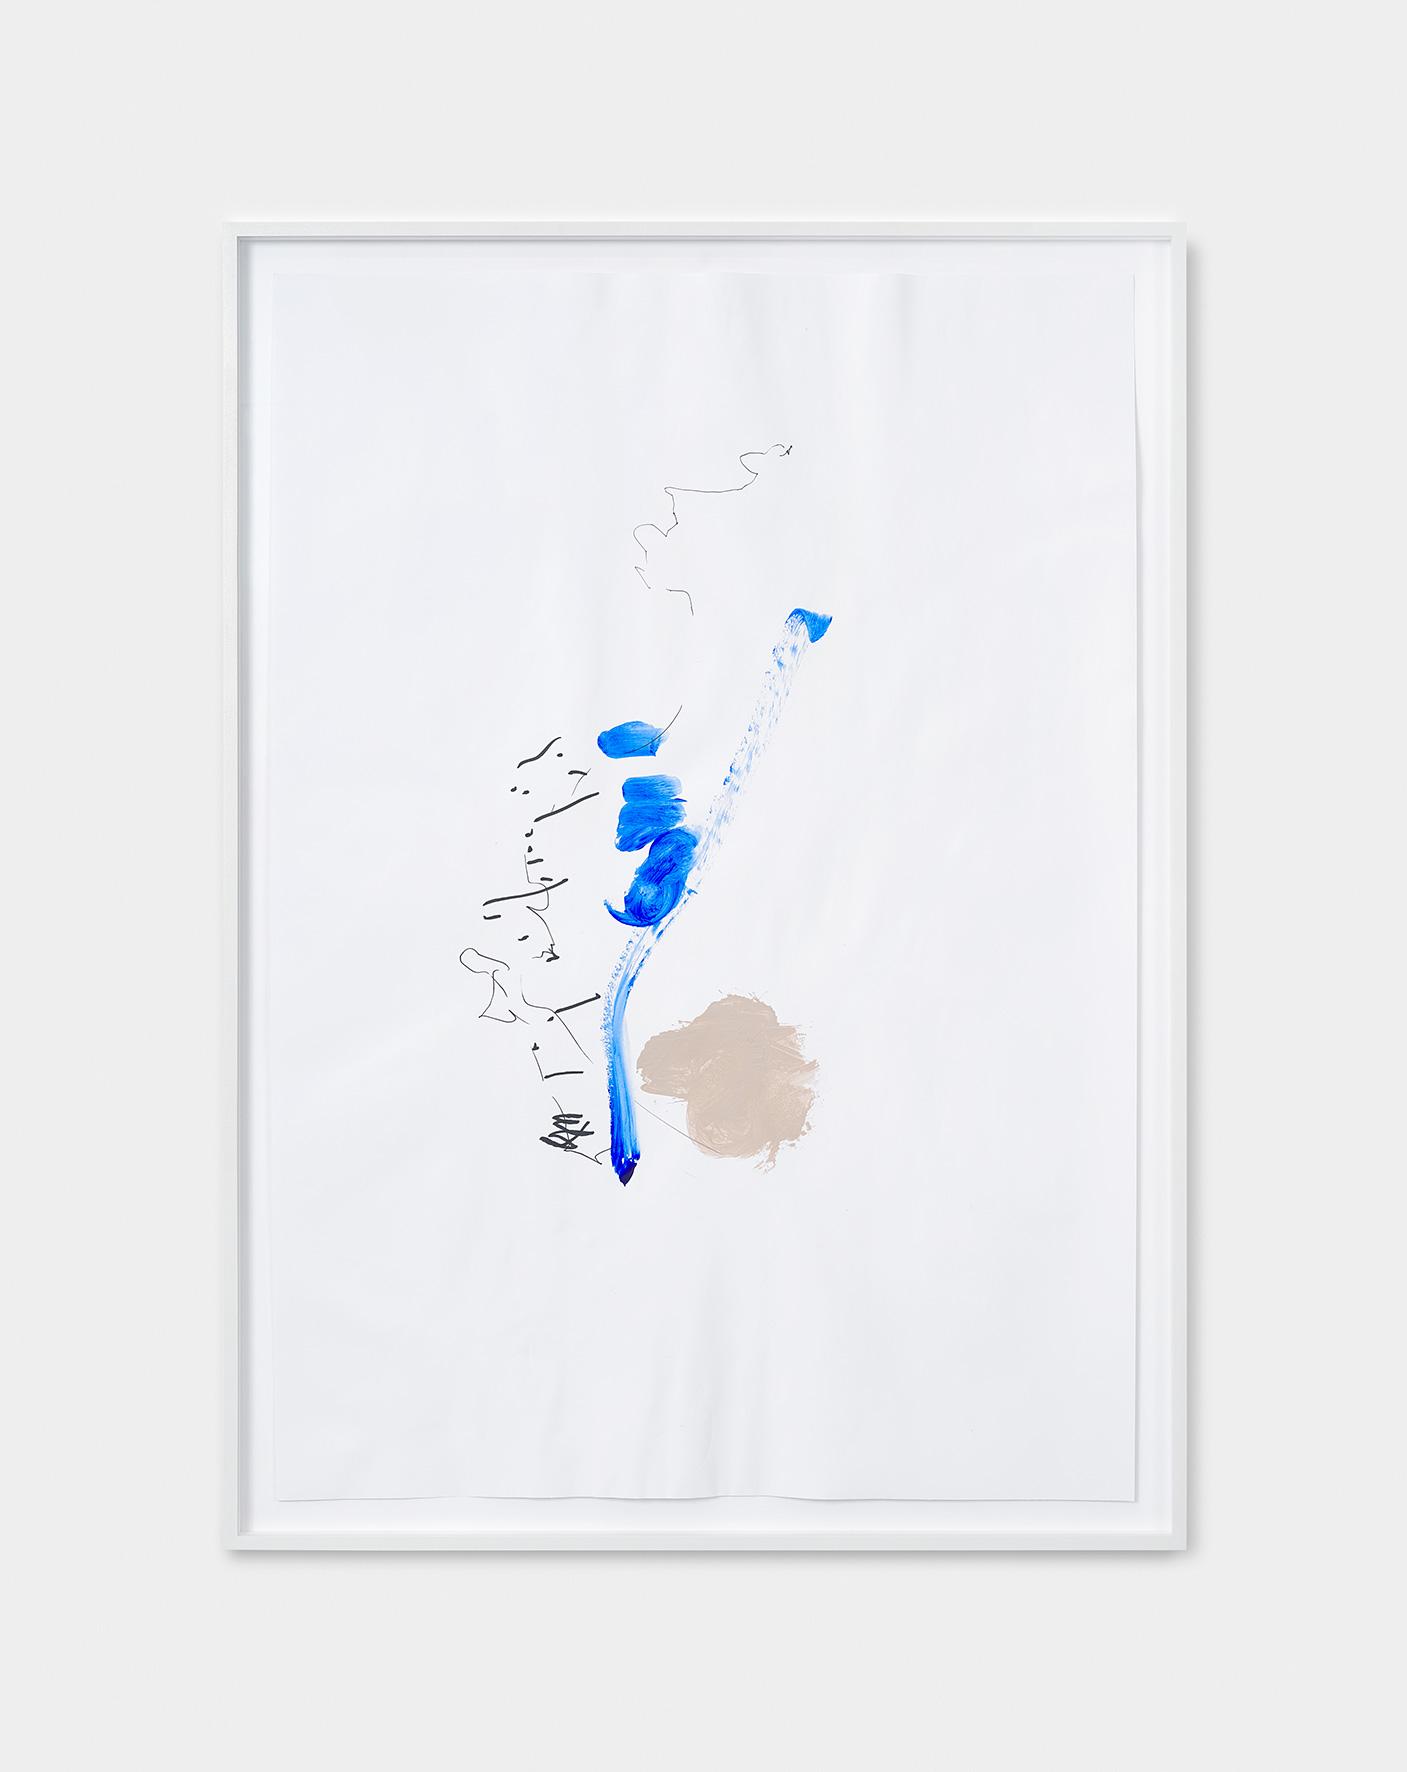 181216 | 2018 | Acryl, Lack, Tusche auf Papier | 95 x 65 cm | ©GALERIE ALBER